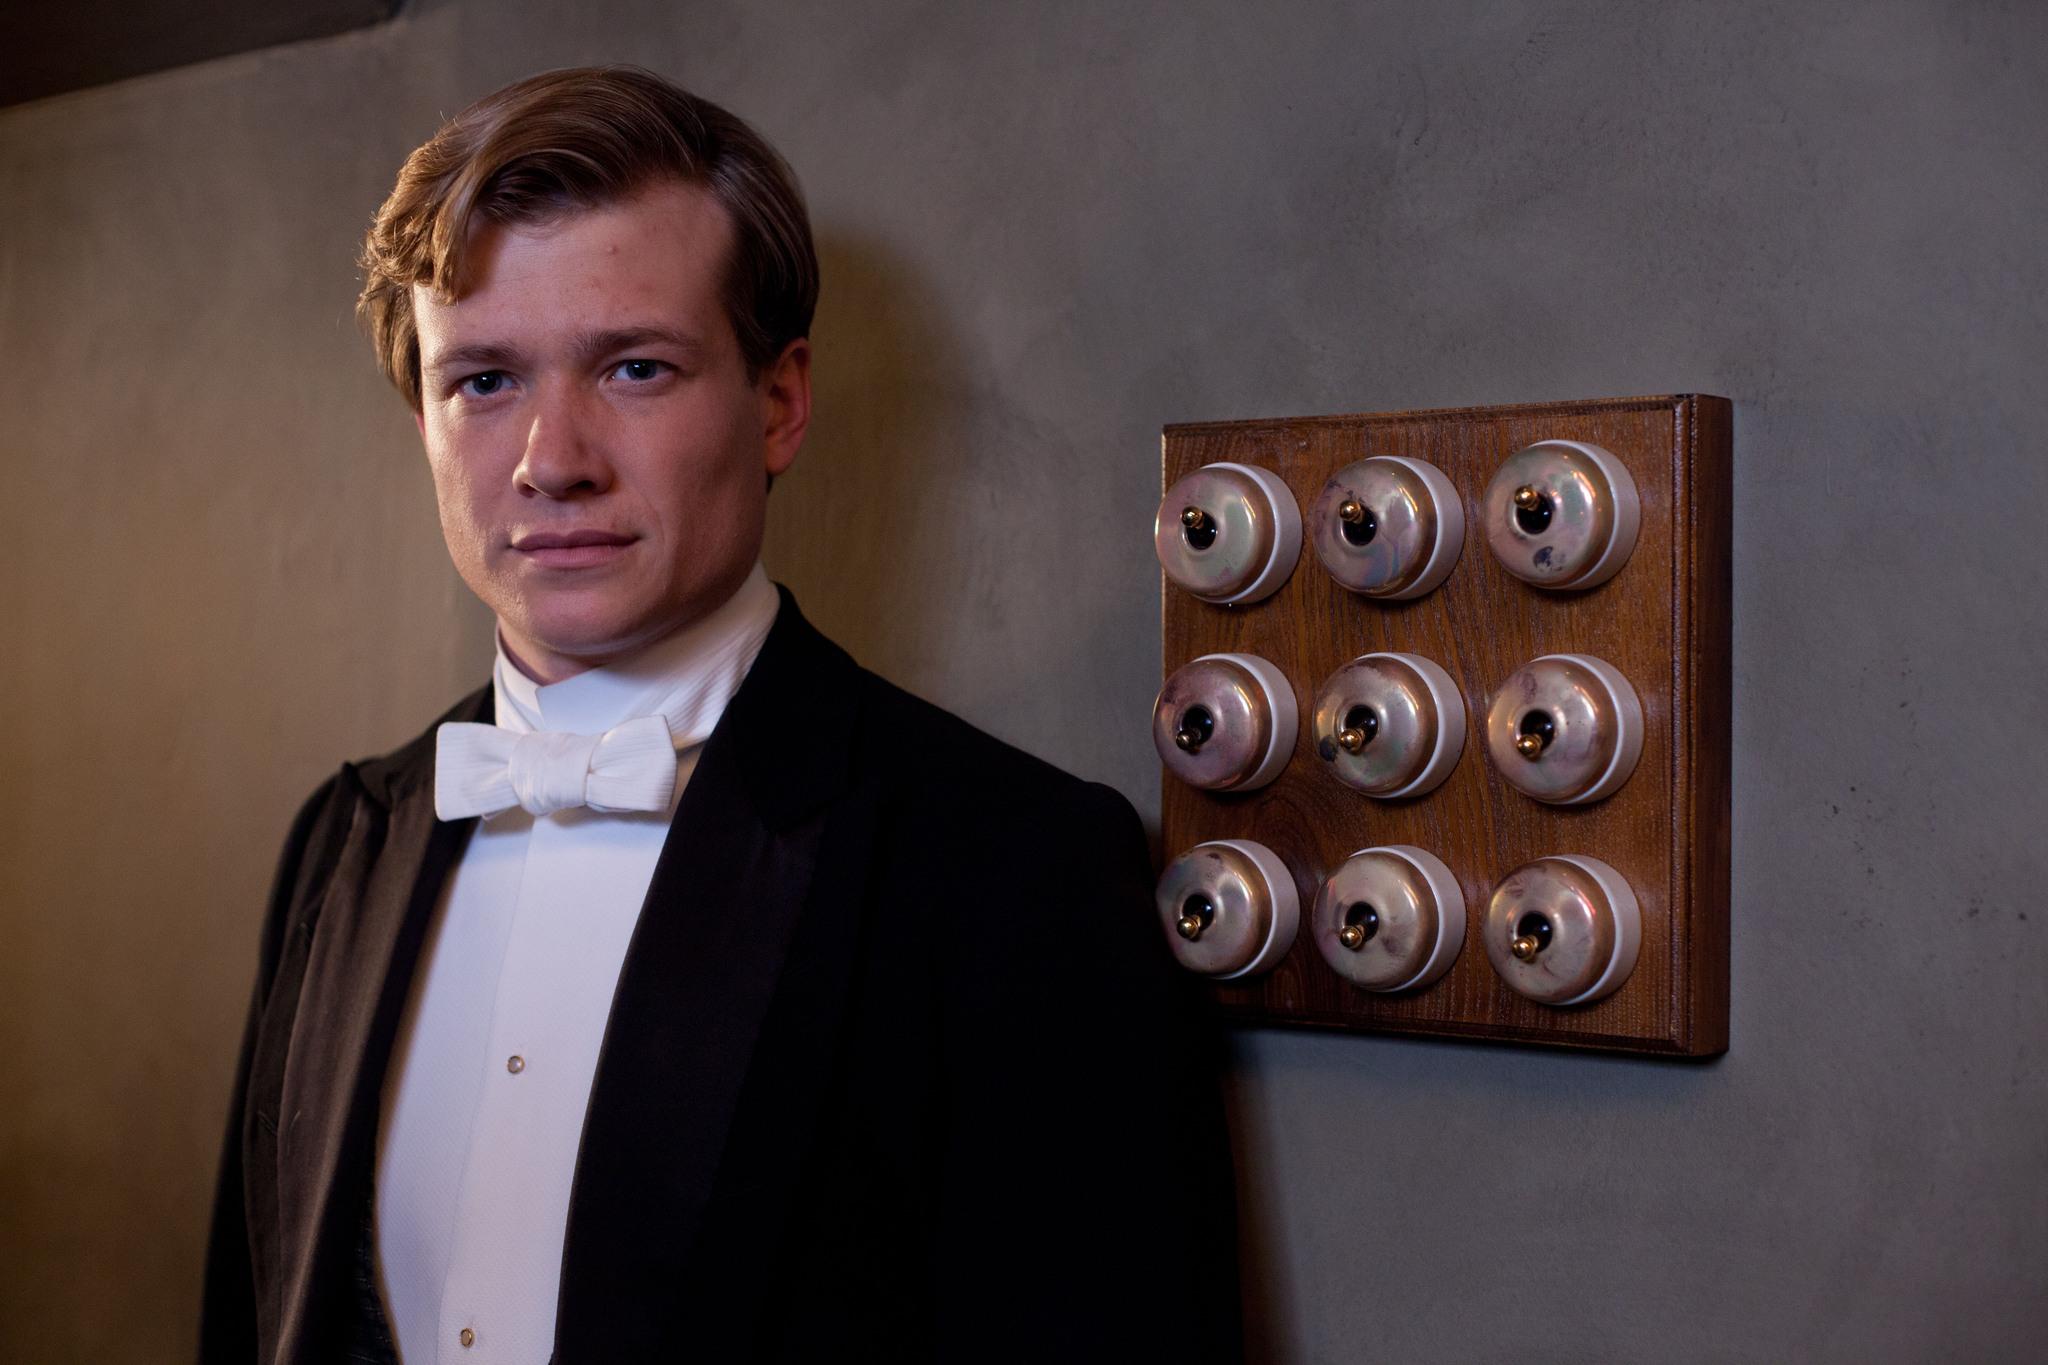 Ed Speleers in Downton Abbey (2010)